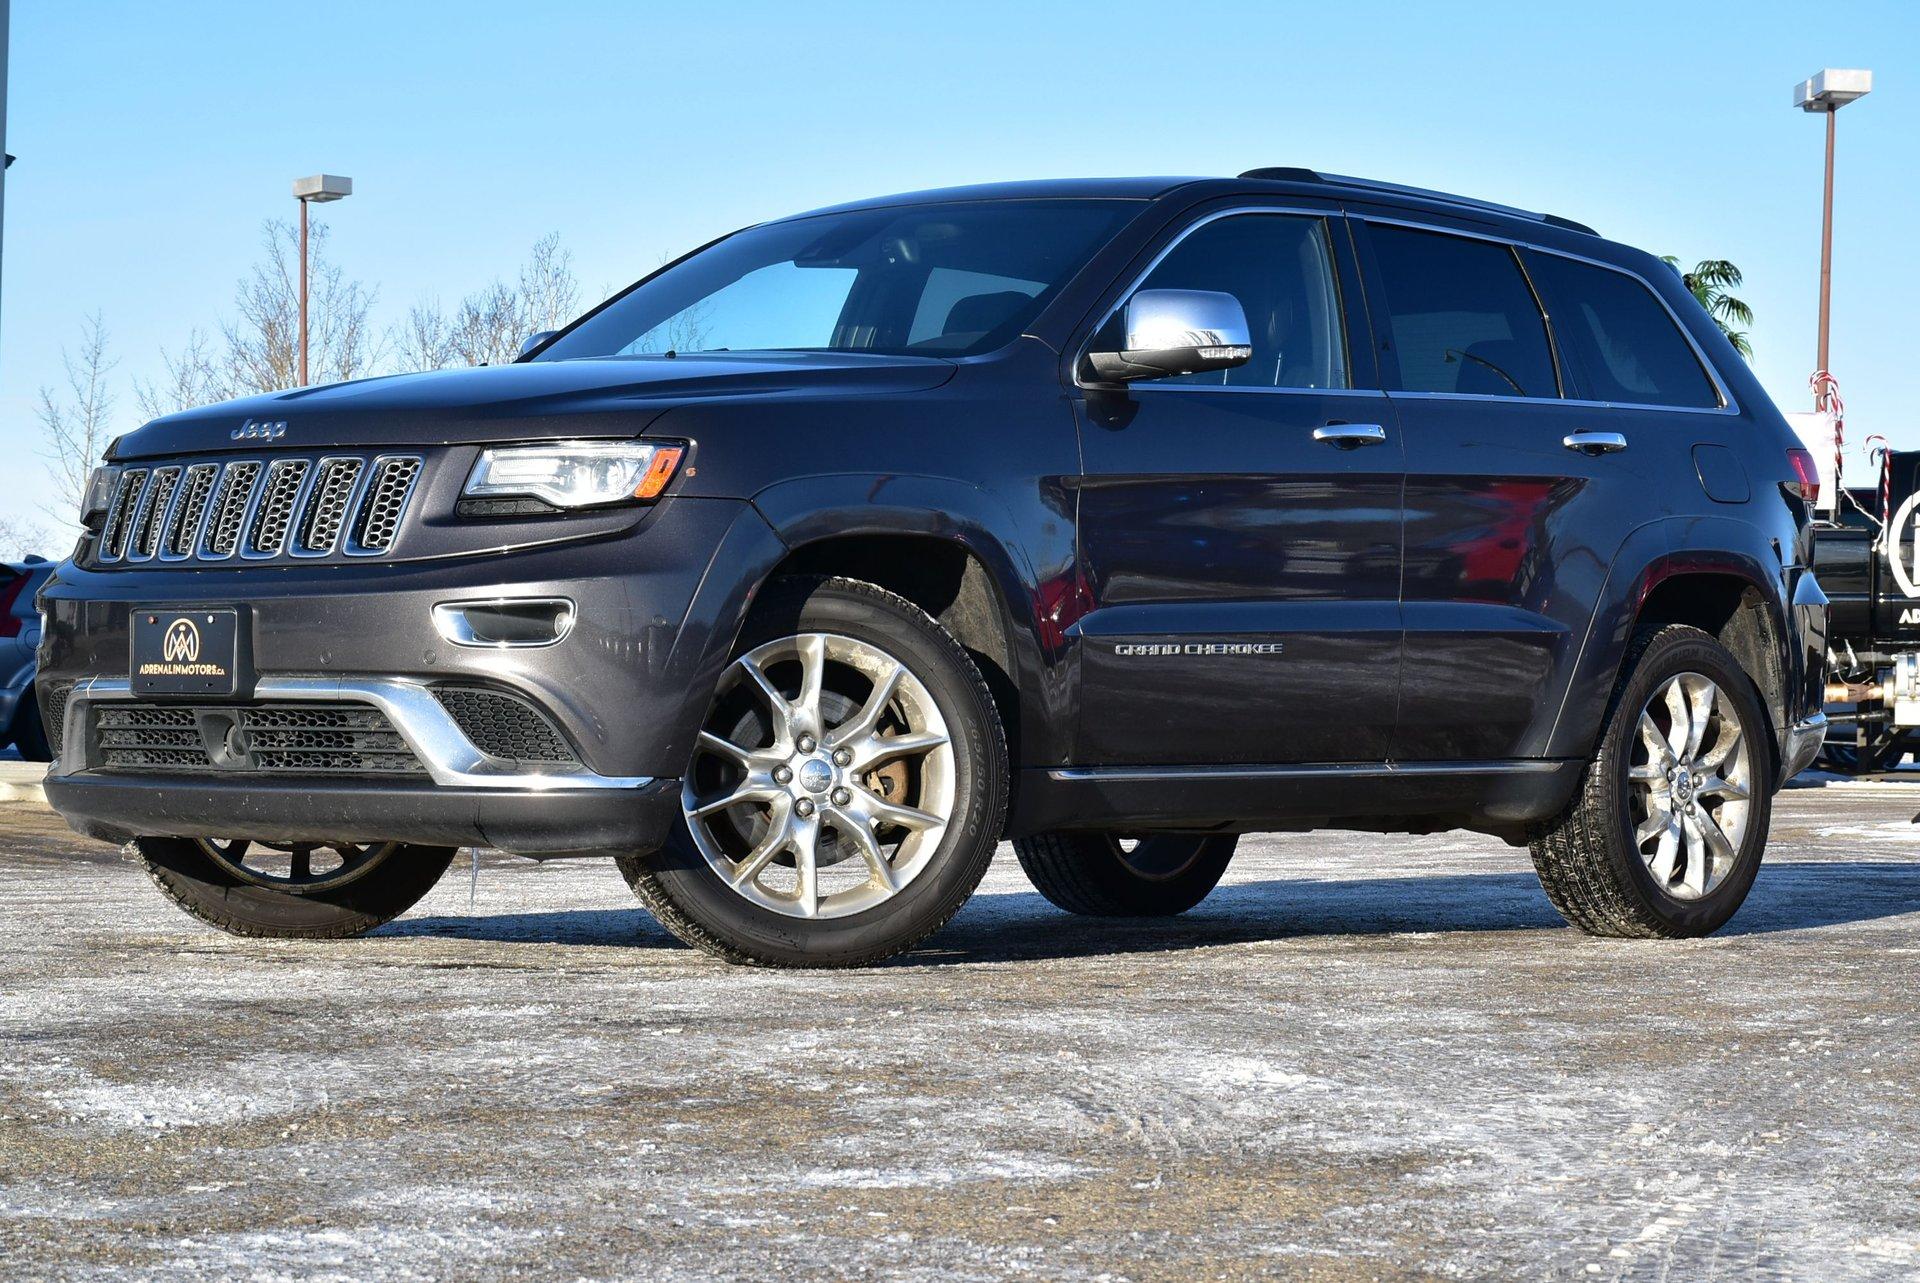 2014 jeep grand cherokee summit turbodiesel